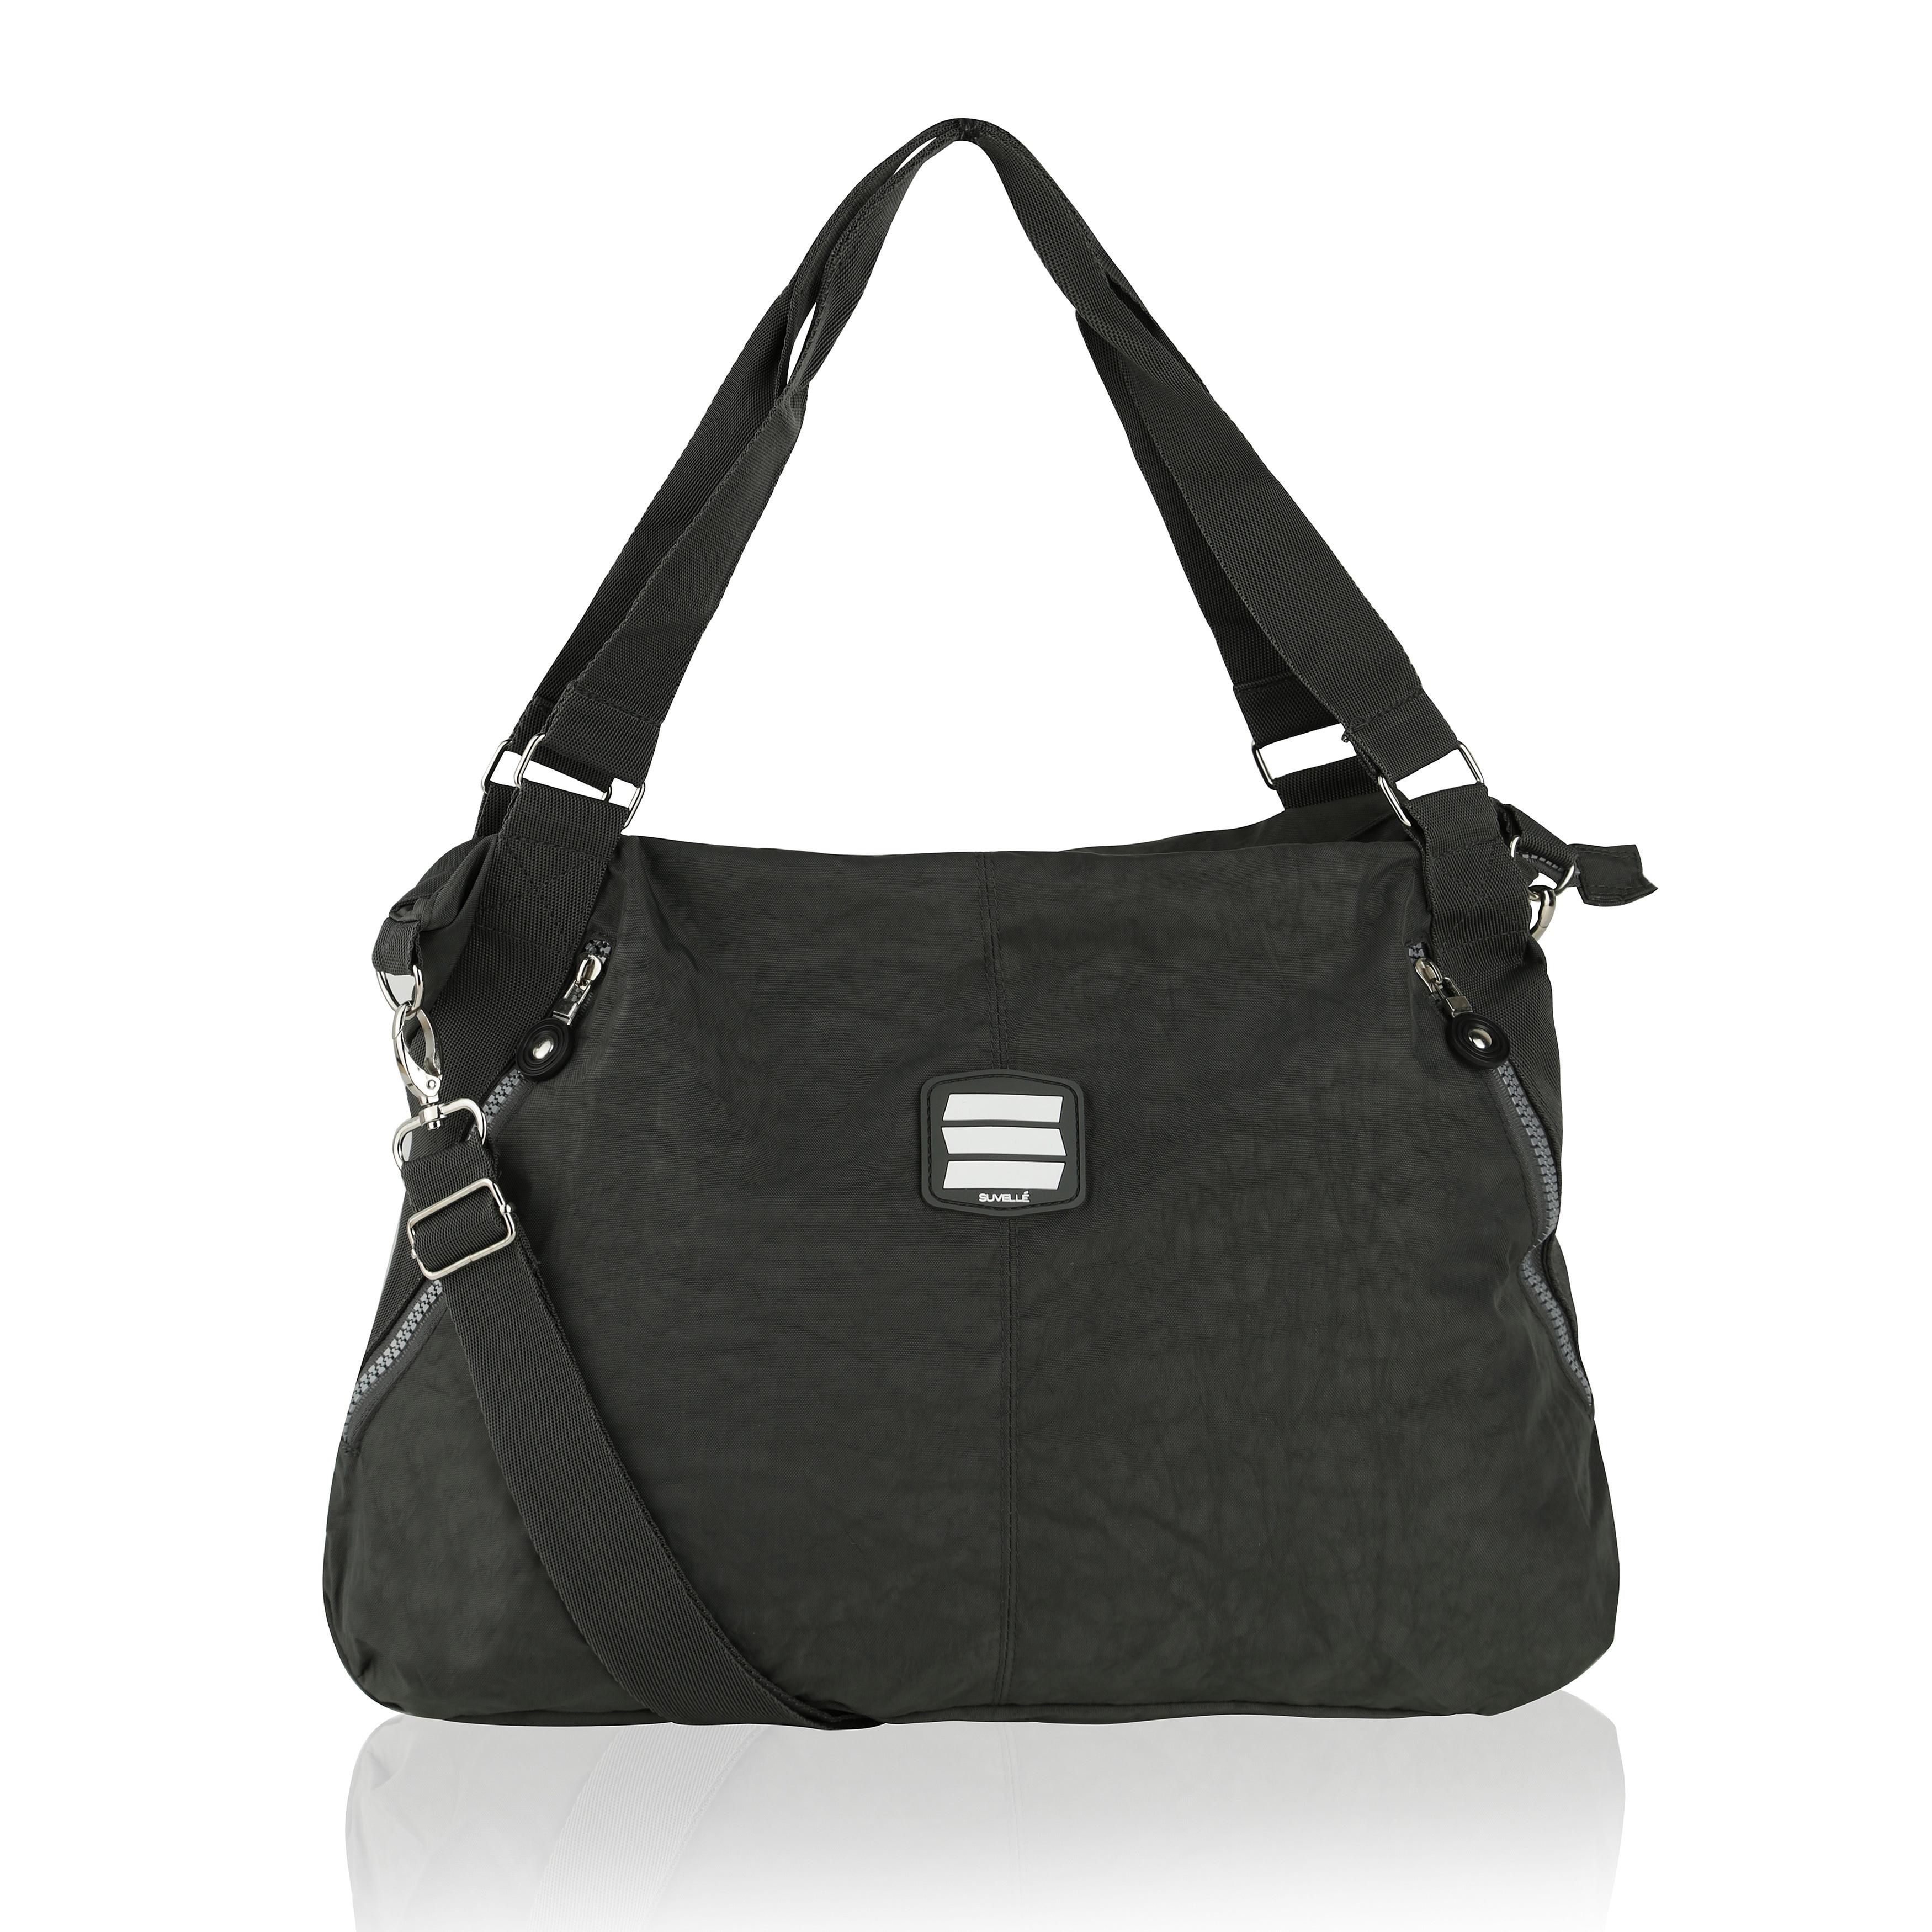 Handbags Shop Our Best Clothing Shoes Deals Online At Katespade Adrien Large Two Tone Authentic